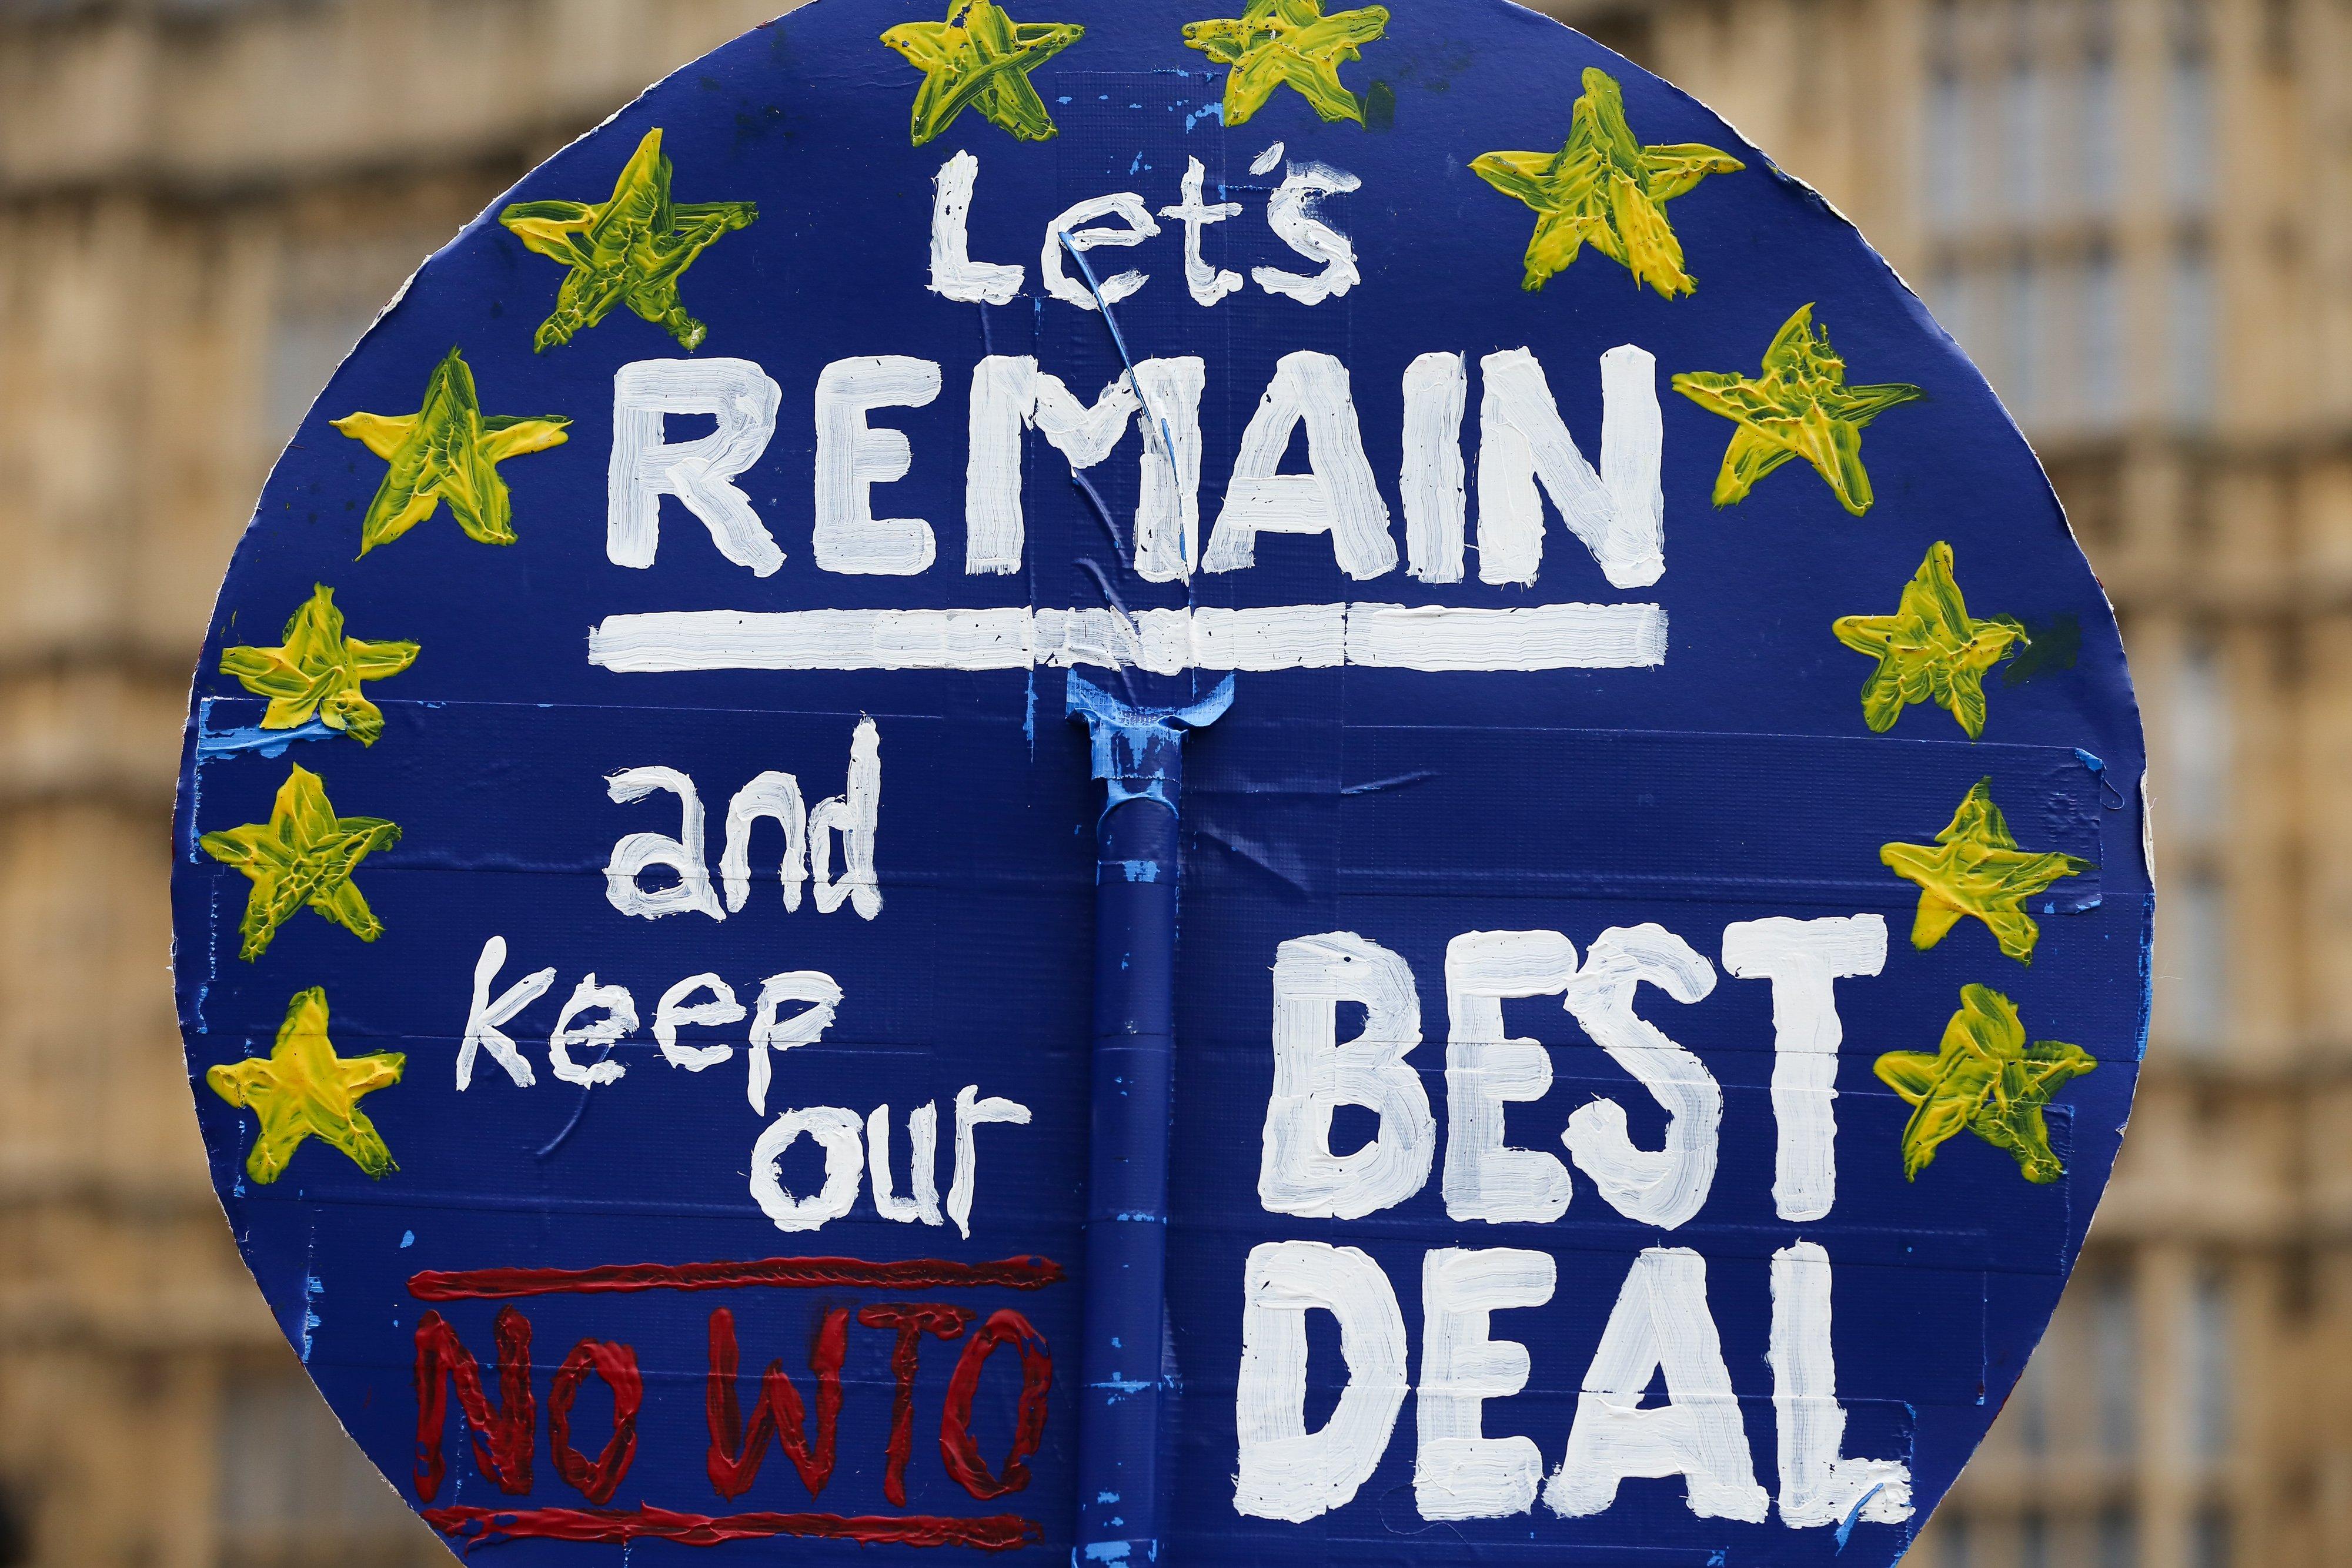 Brexit - referendum